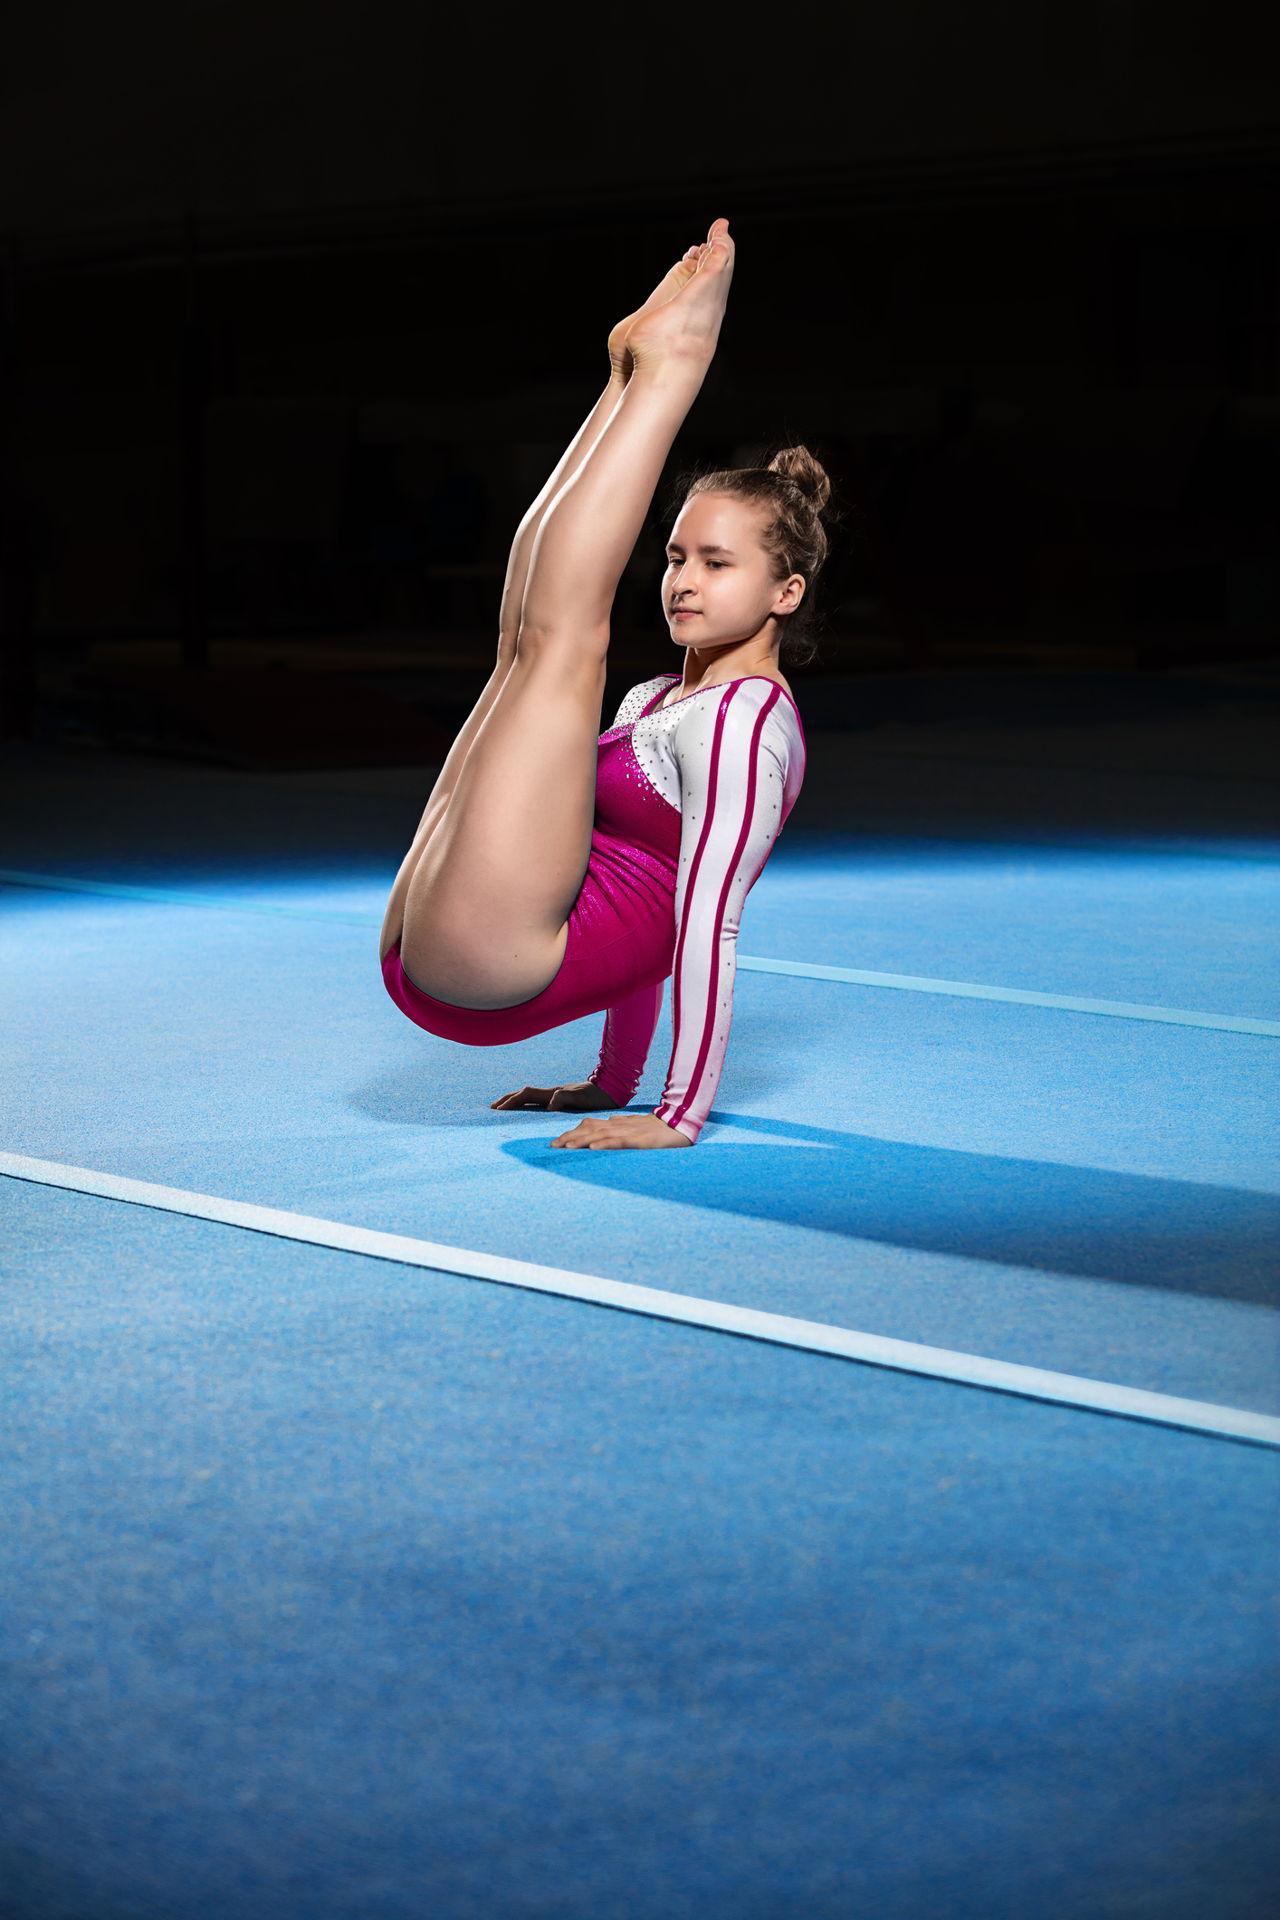 Gymnast pic photos 10